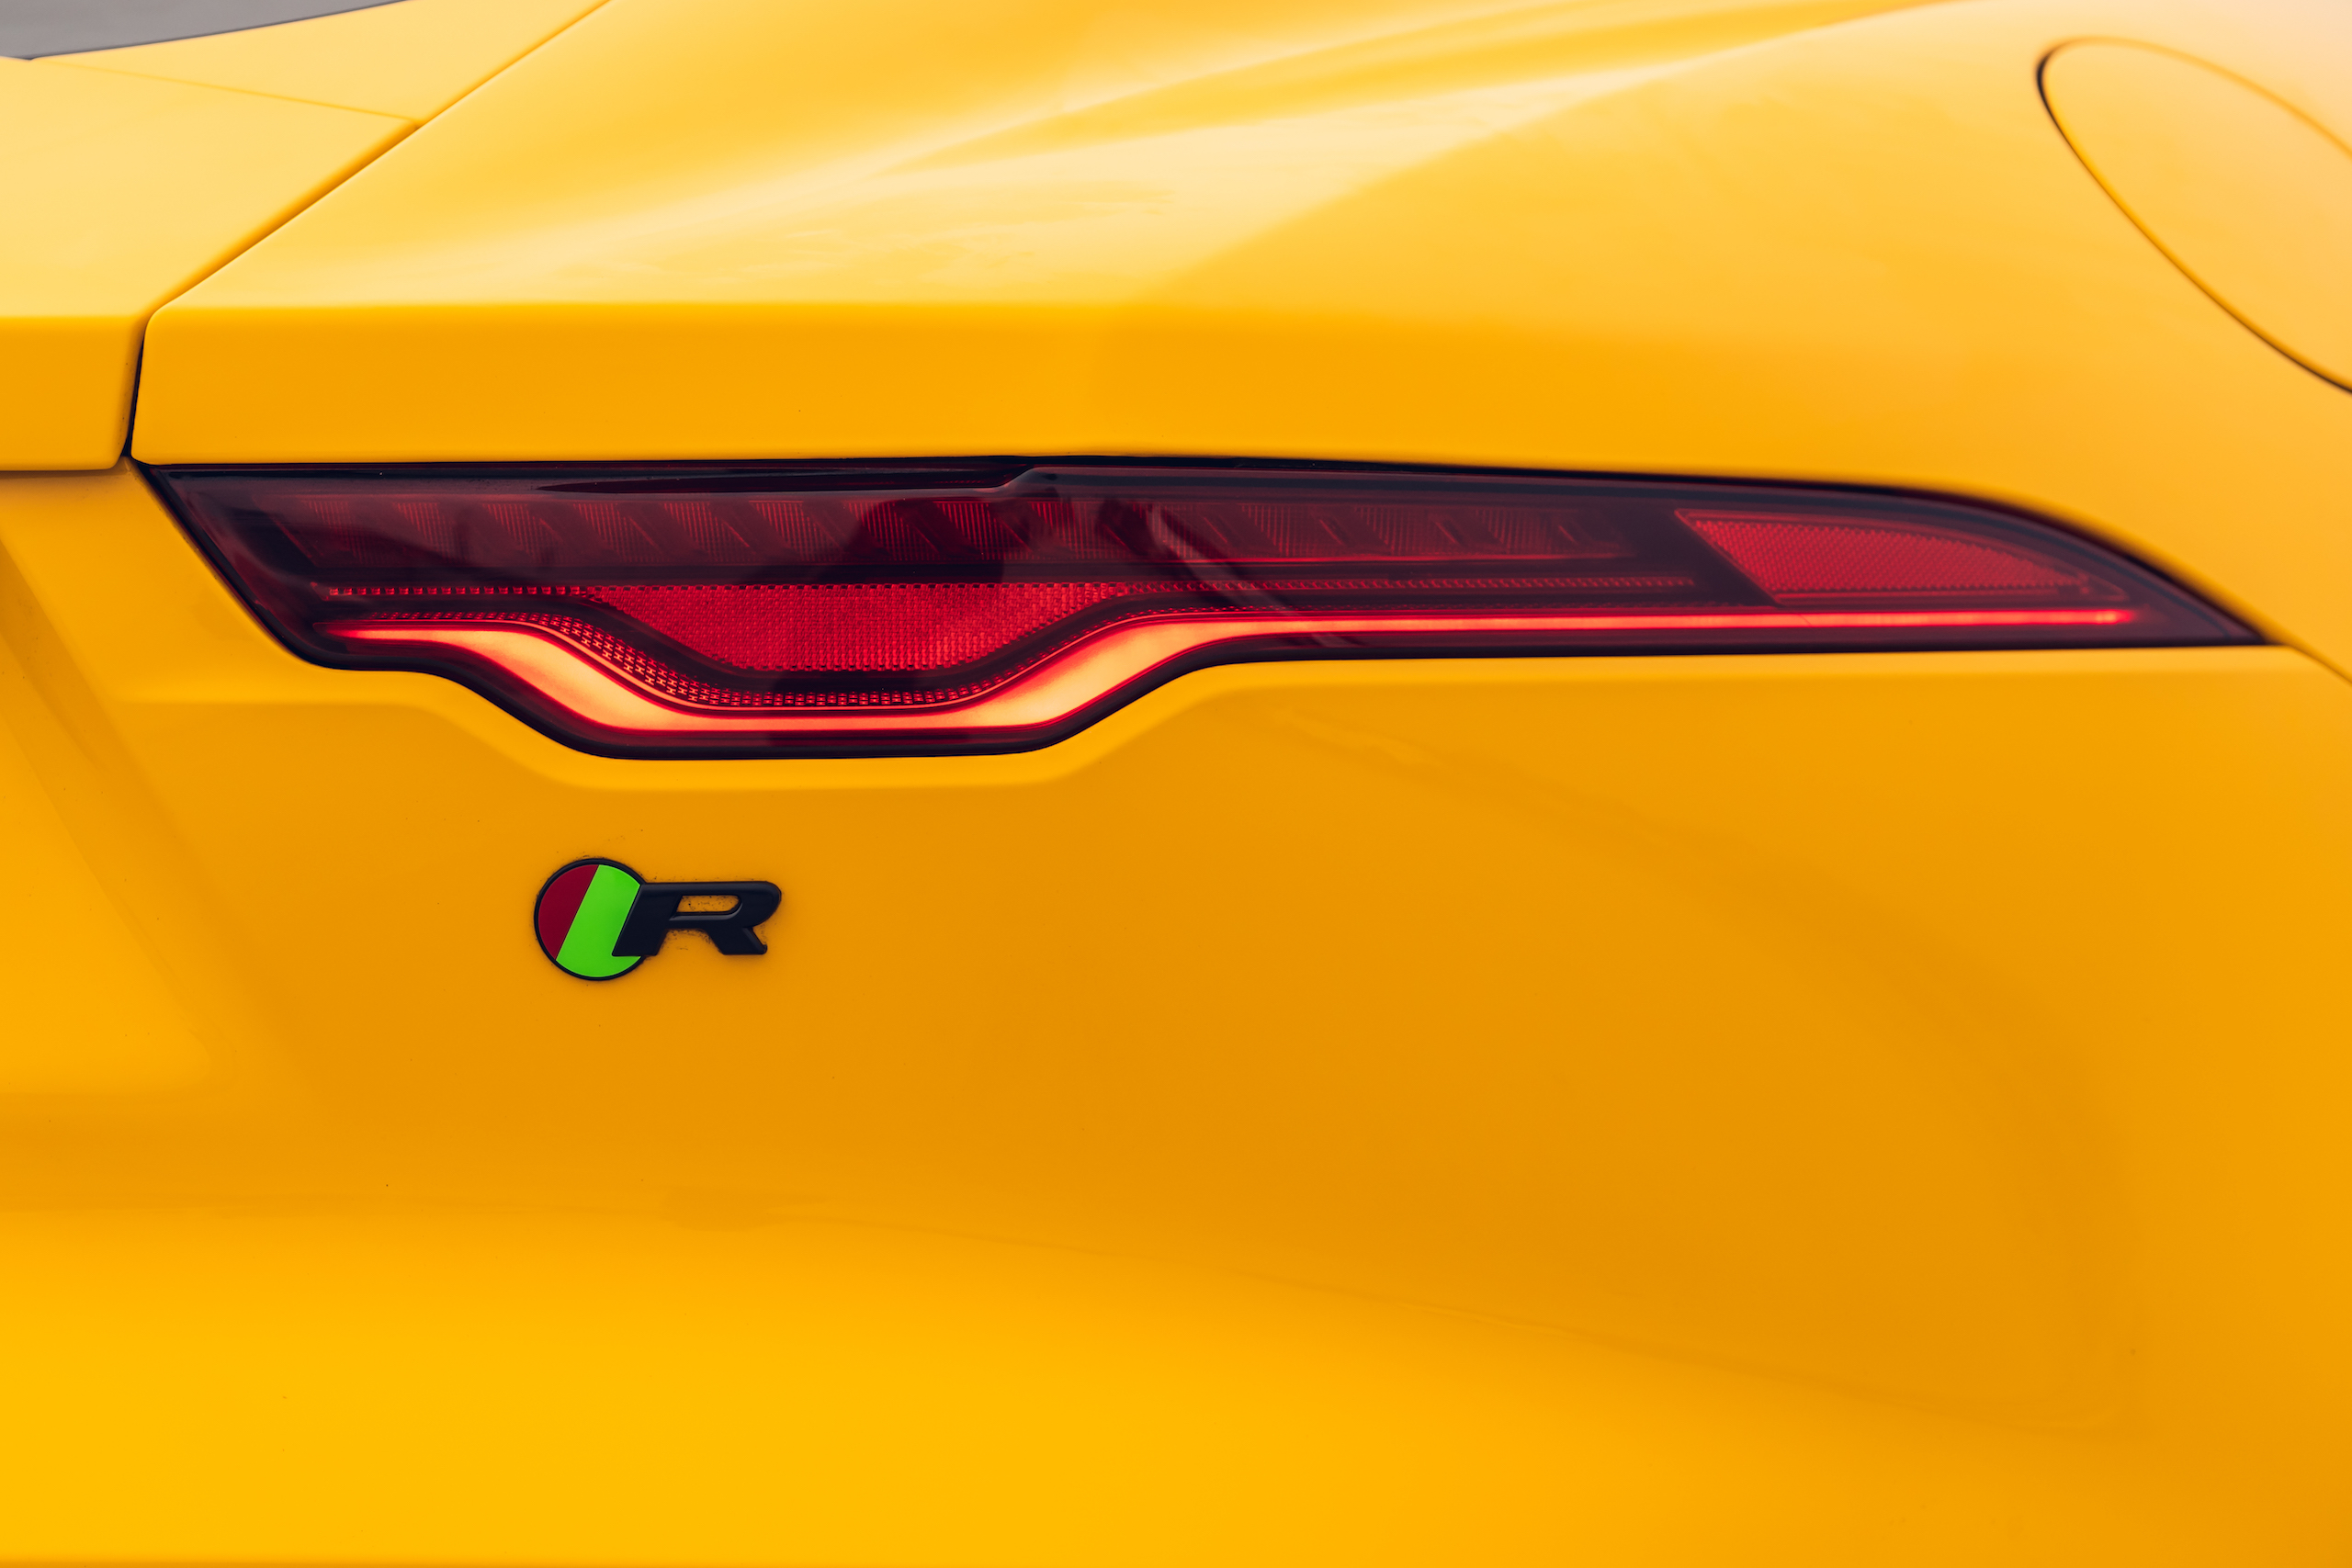 2021 Jaguar F-TYPE_R Coupe badge